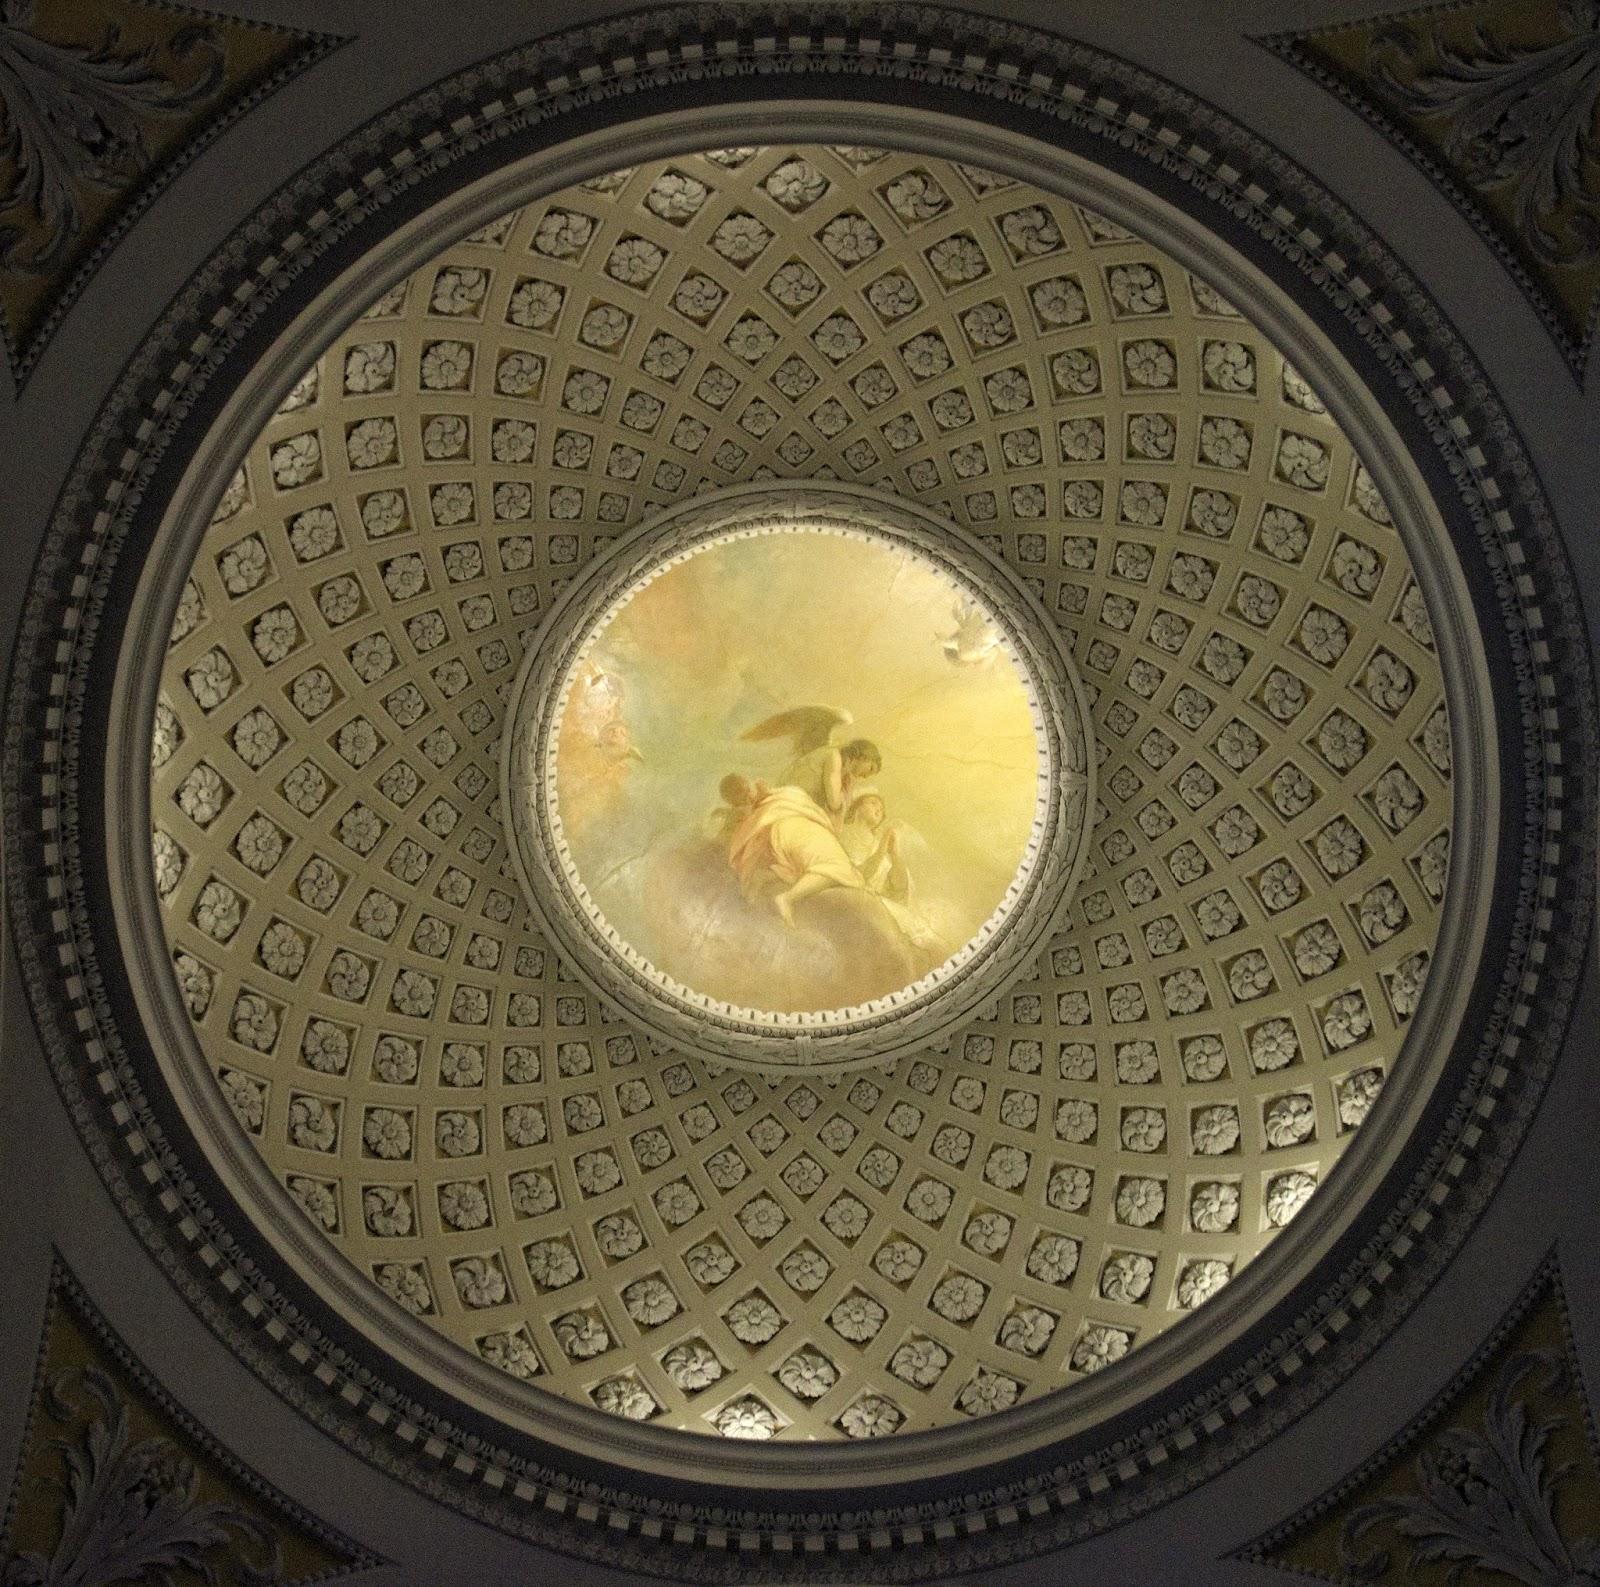 http://4.bp.blogspot.com/-1W4Vqibs4lk/U0xRg2lzCVI/AAAAAAAAO-A/XnPoVy5TbPY/s600/Nikolaikirche+Atrium+Ceiling.jpg